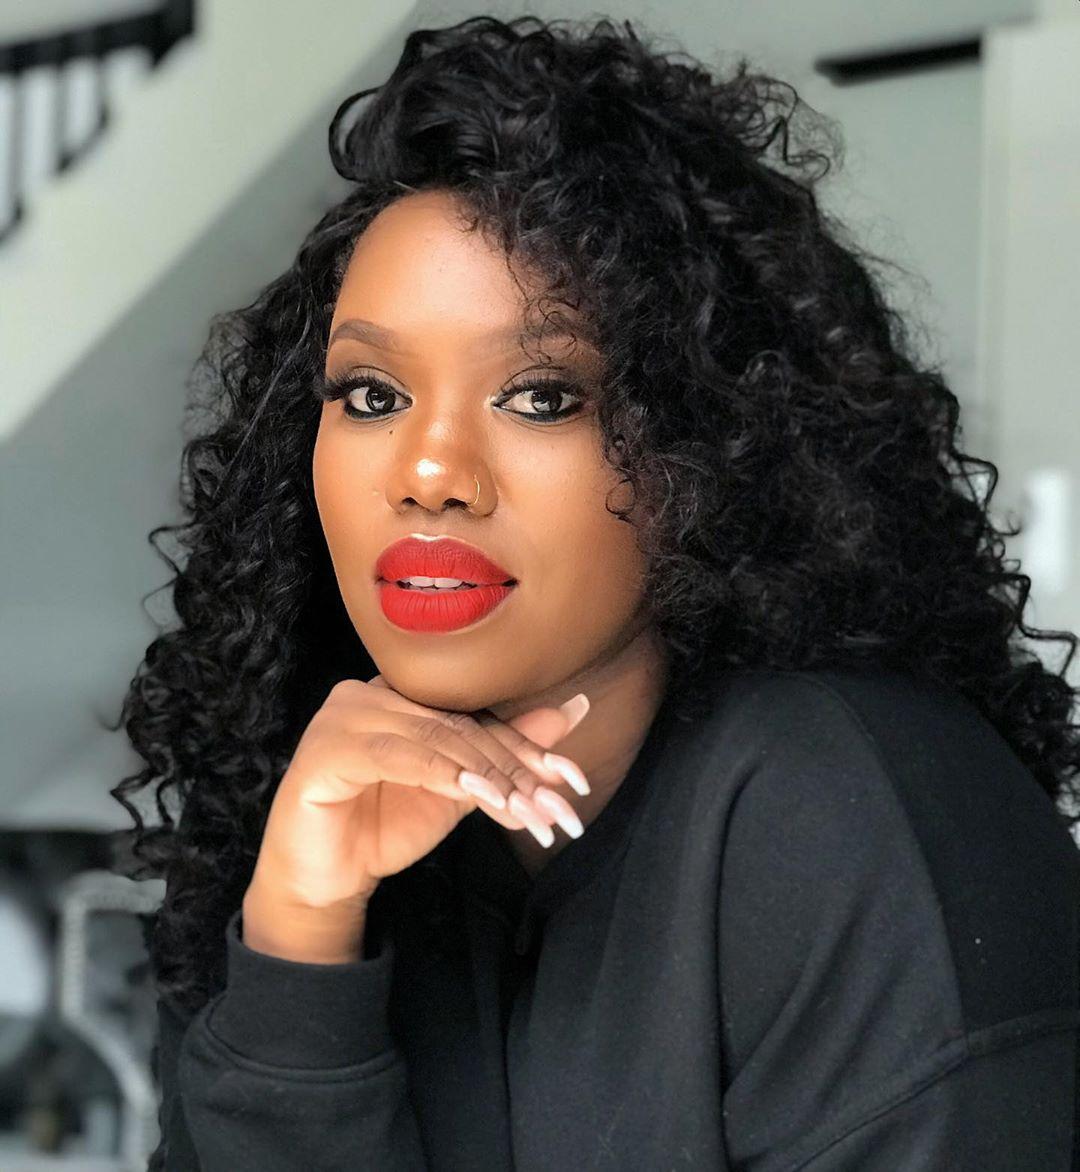 #RIPMom: Condolences pour in to Uzalo actress Gugu Gumede